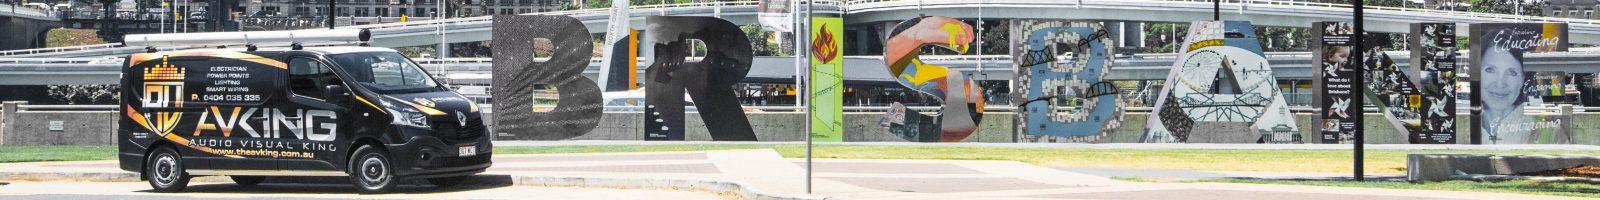 Brilliant Brisbane Data Technician Specialising In Smart Wiring Wiring Cloud Oideiuggs Outletorg